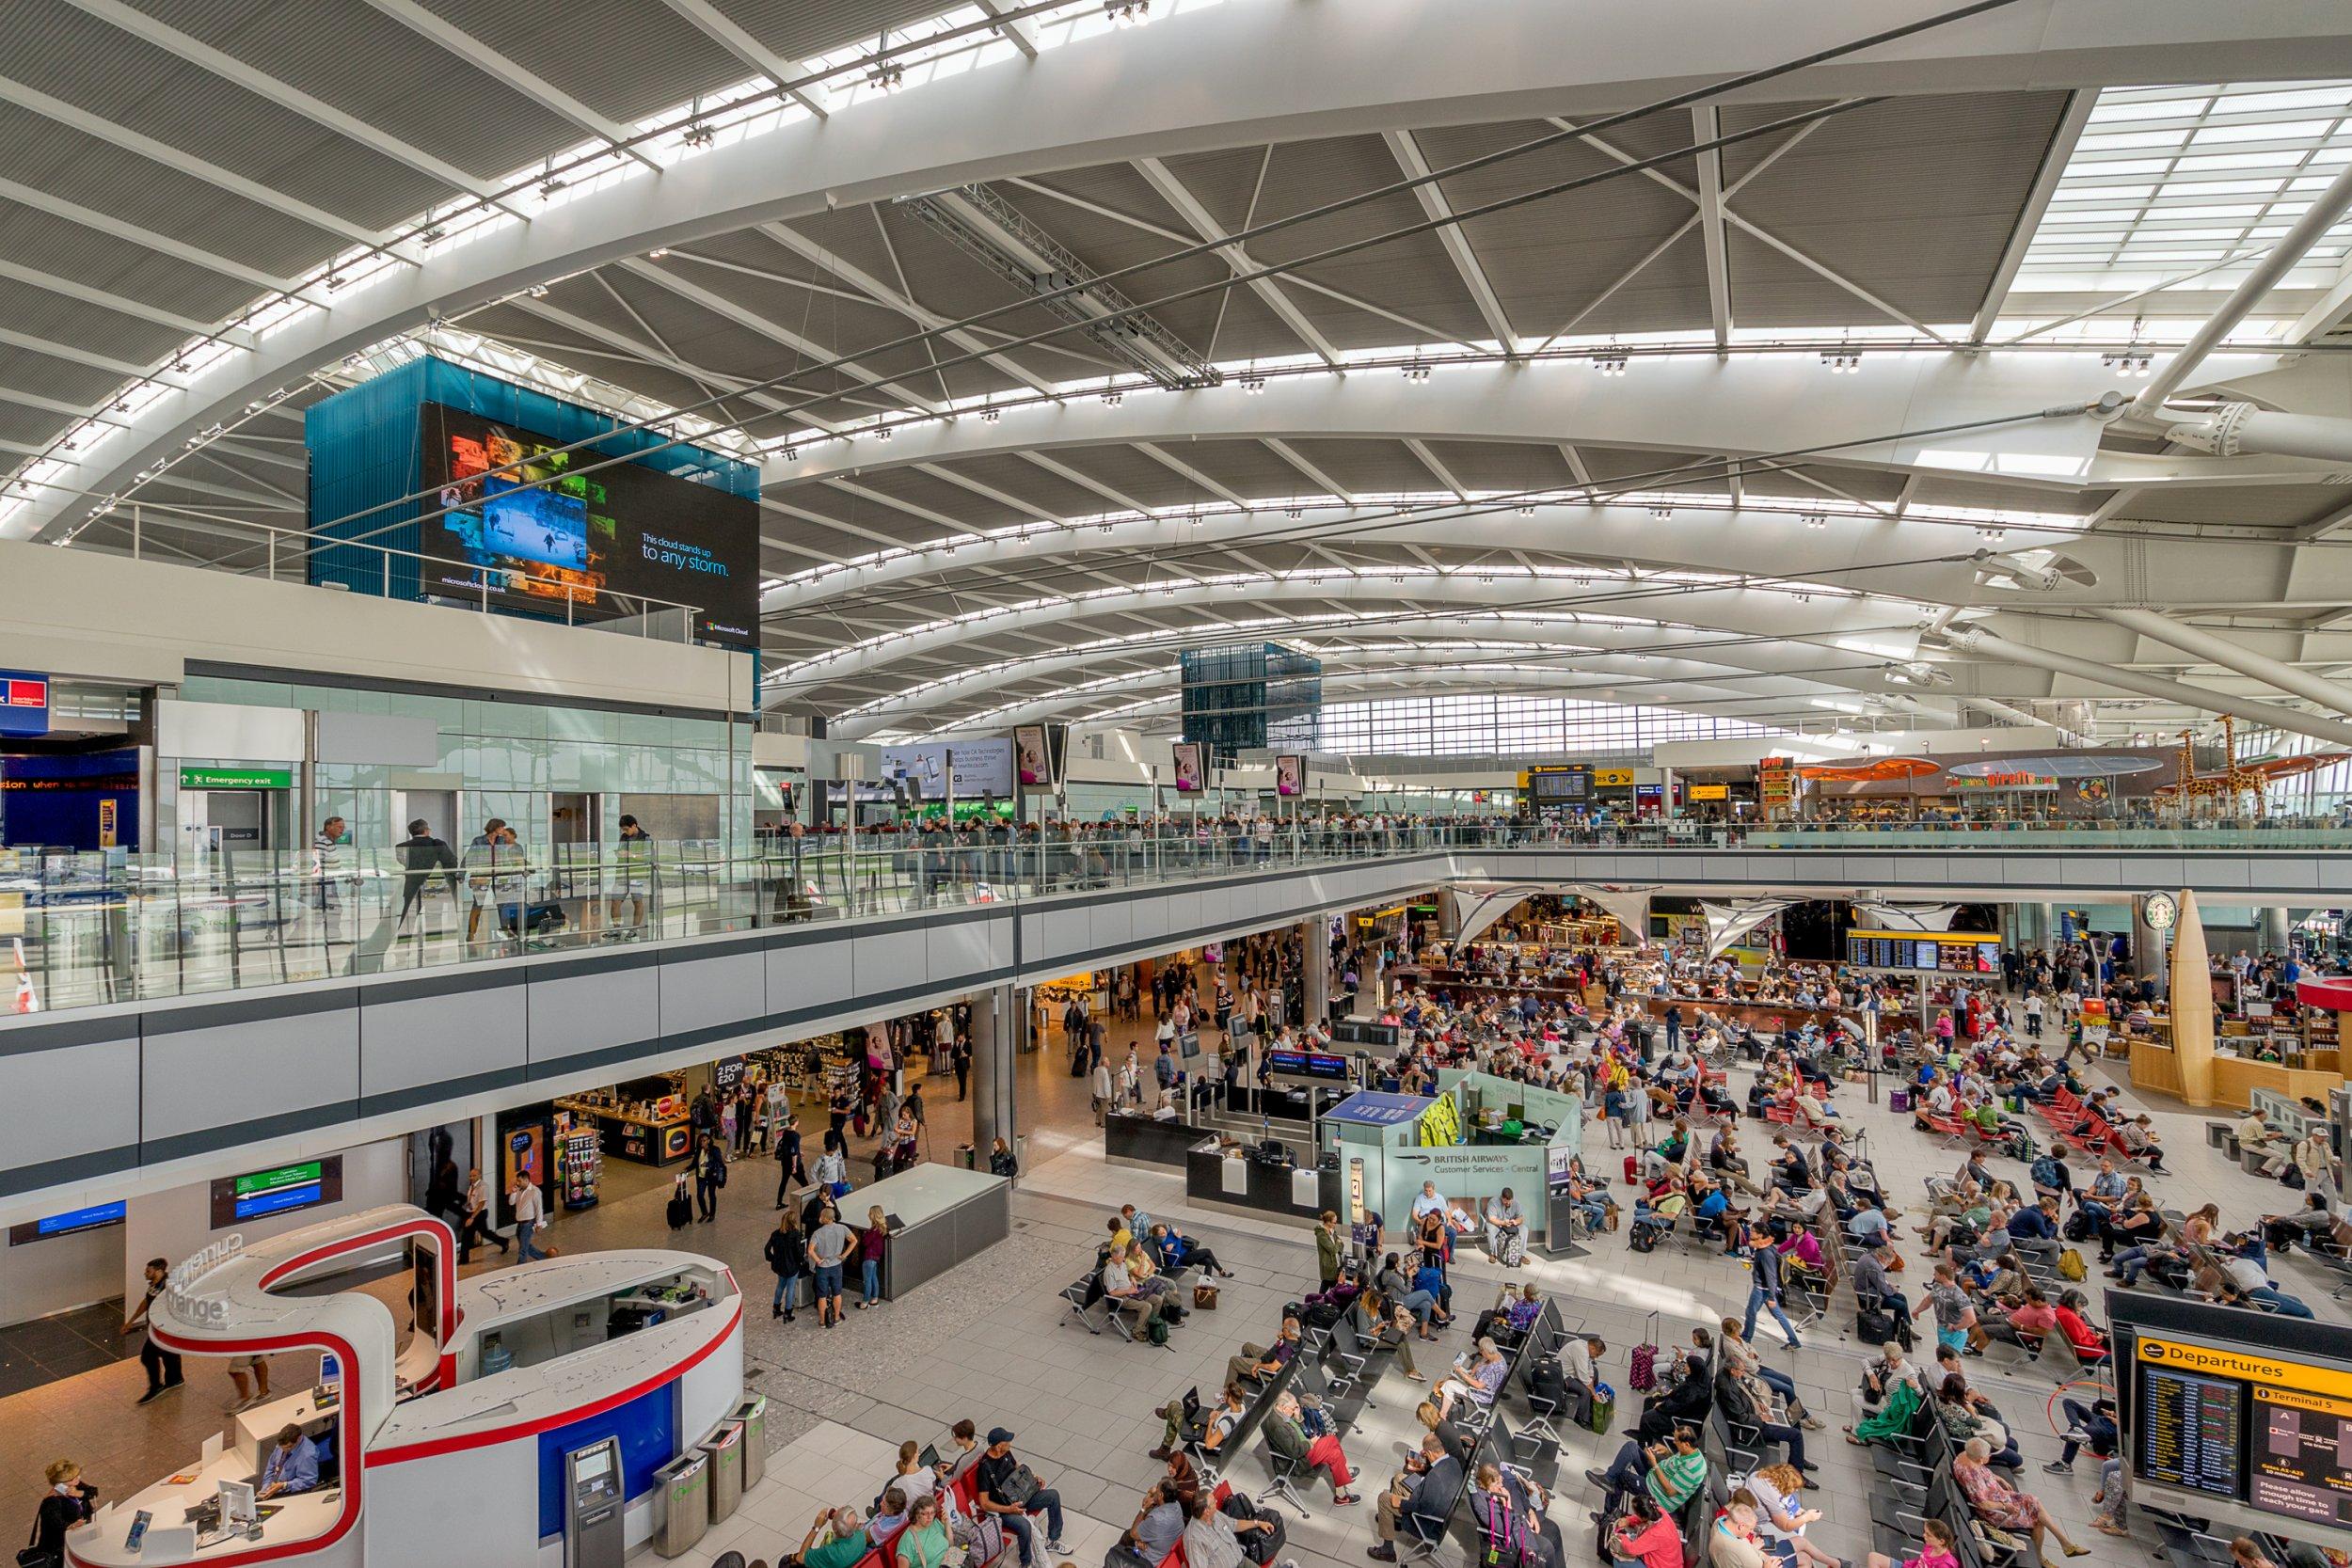 8 London Heathrow Airport